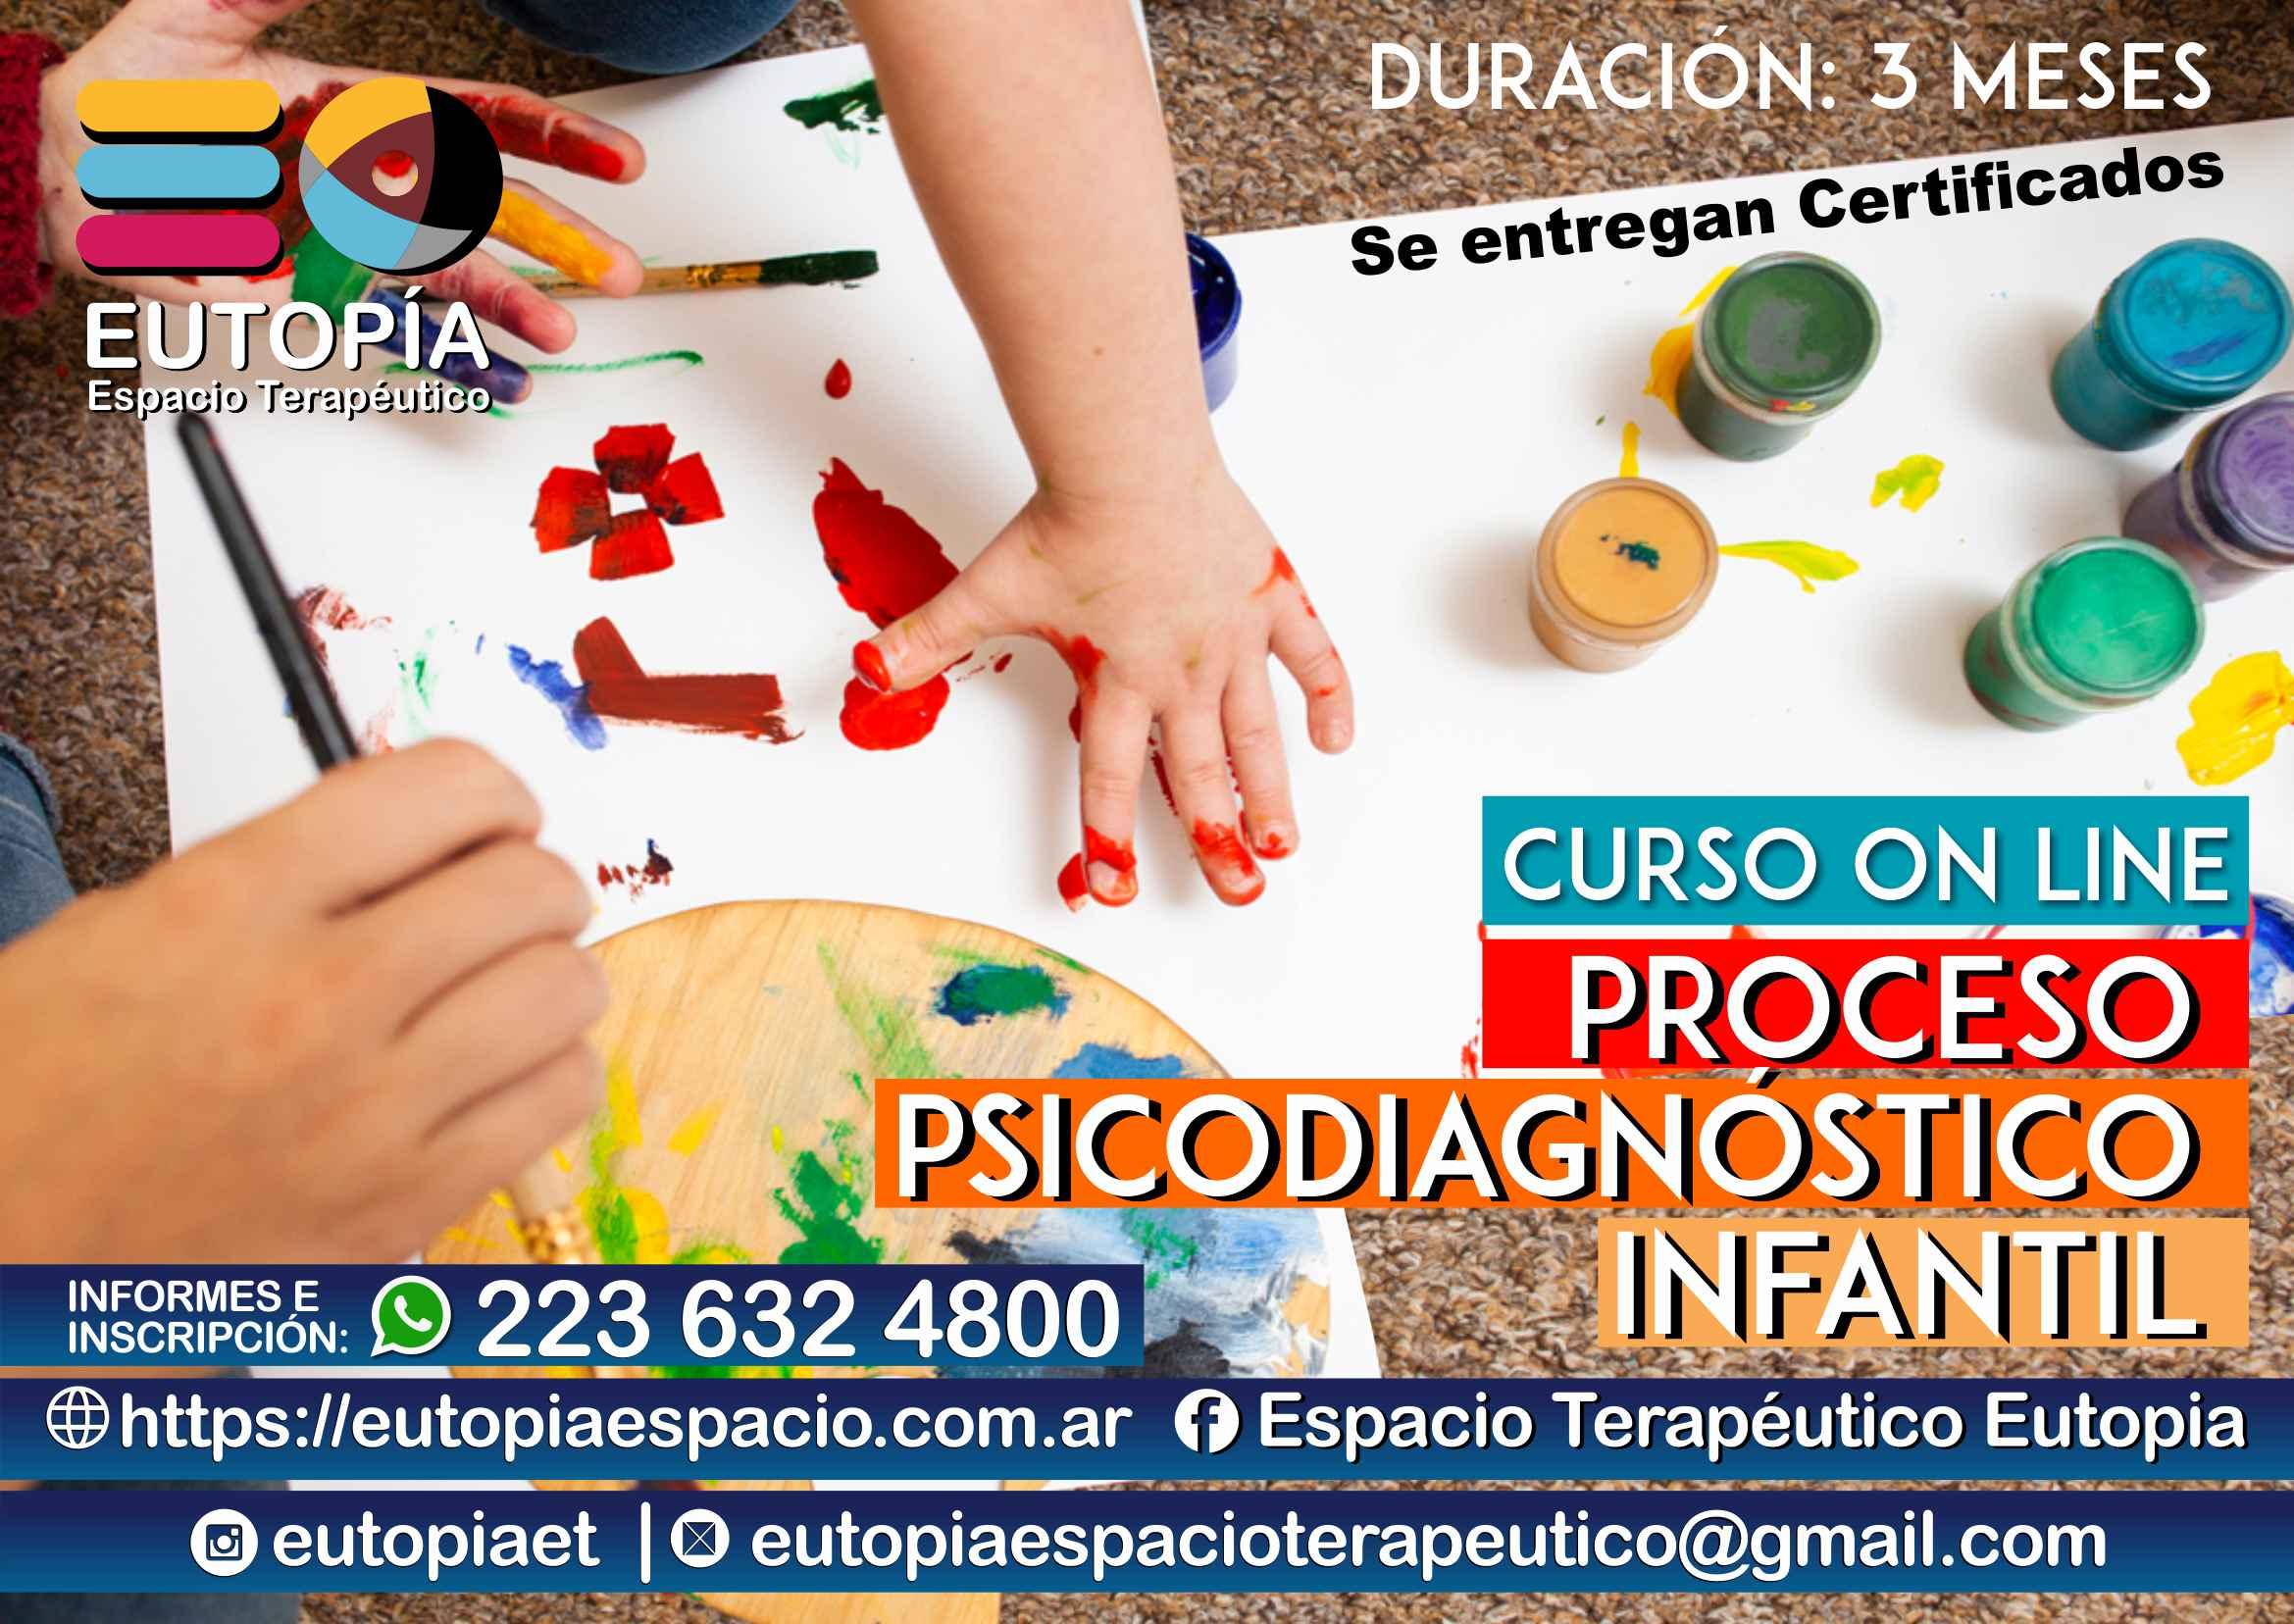 Proceso Psicodiagnostico Infantil